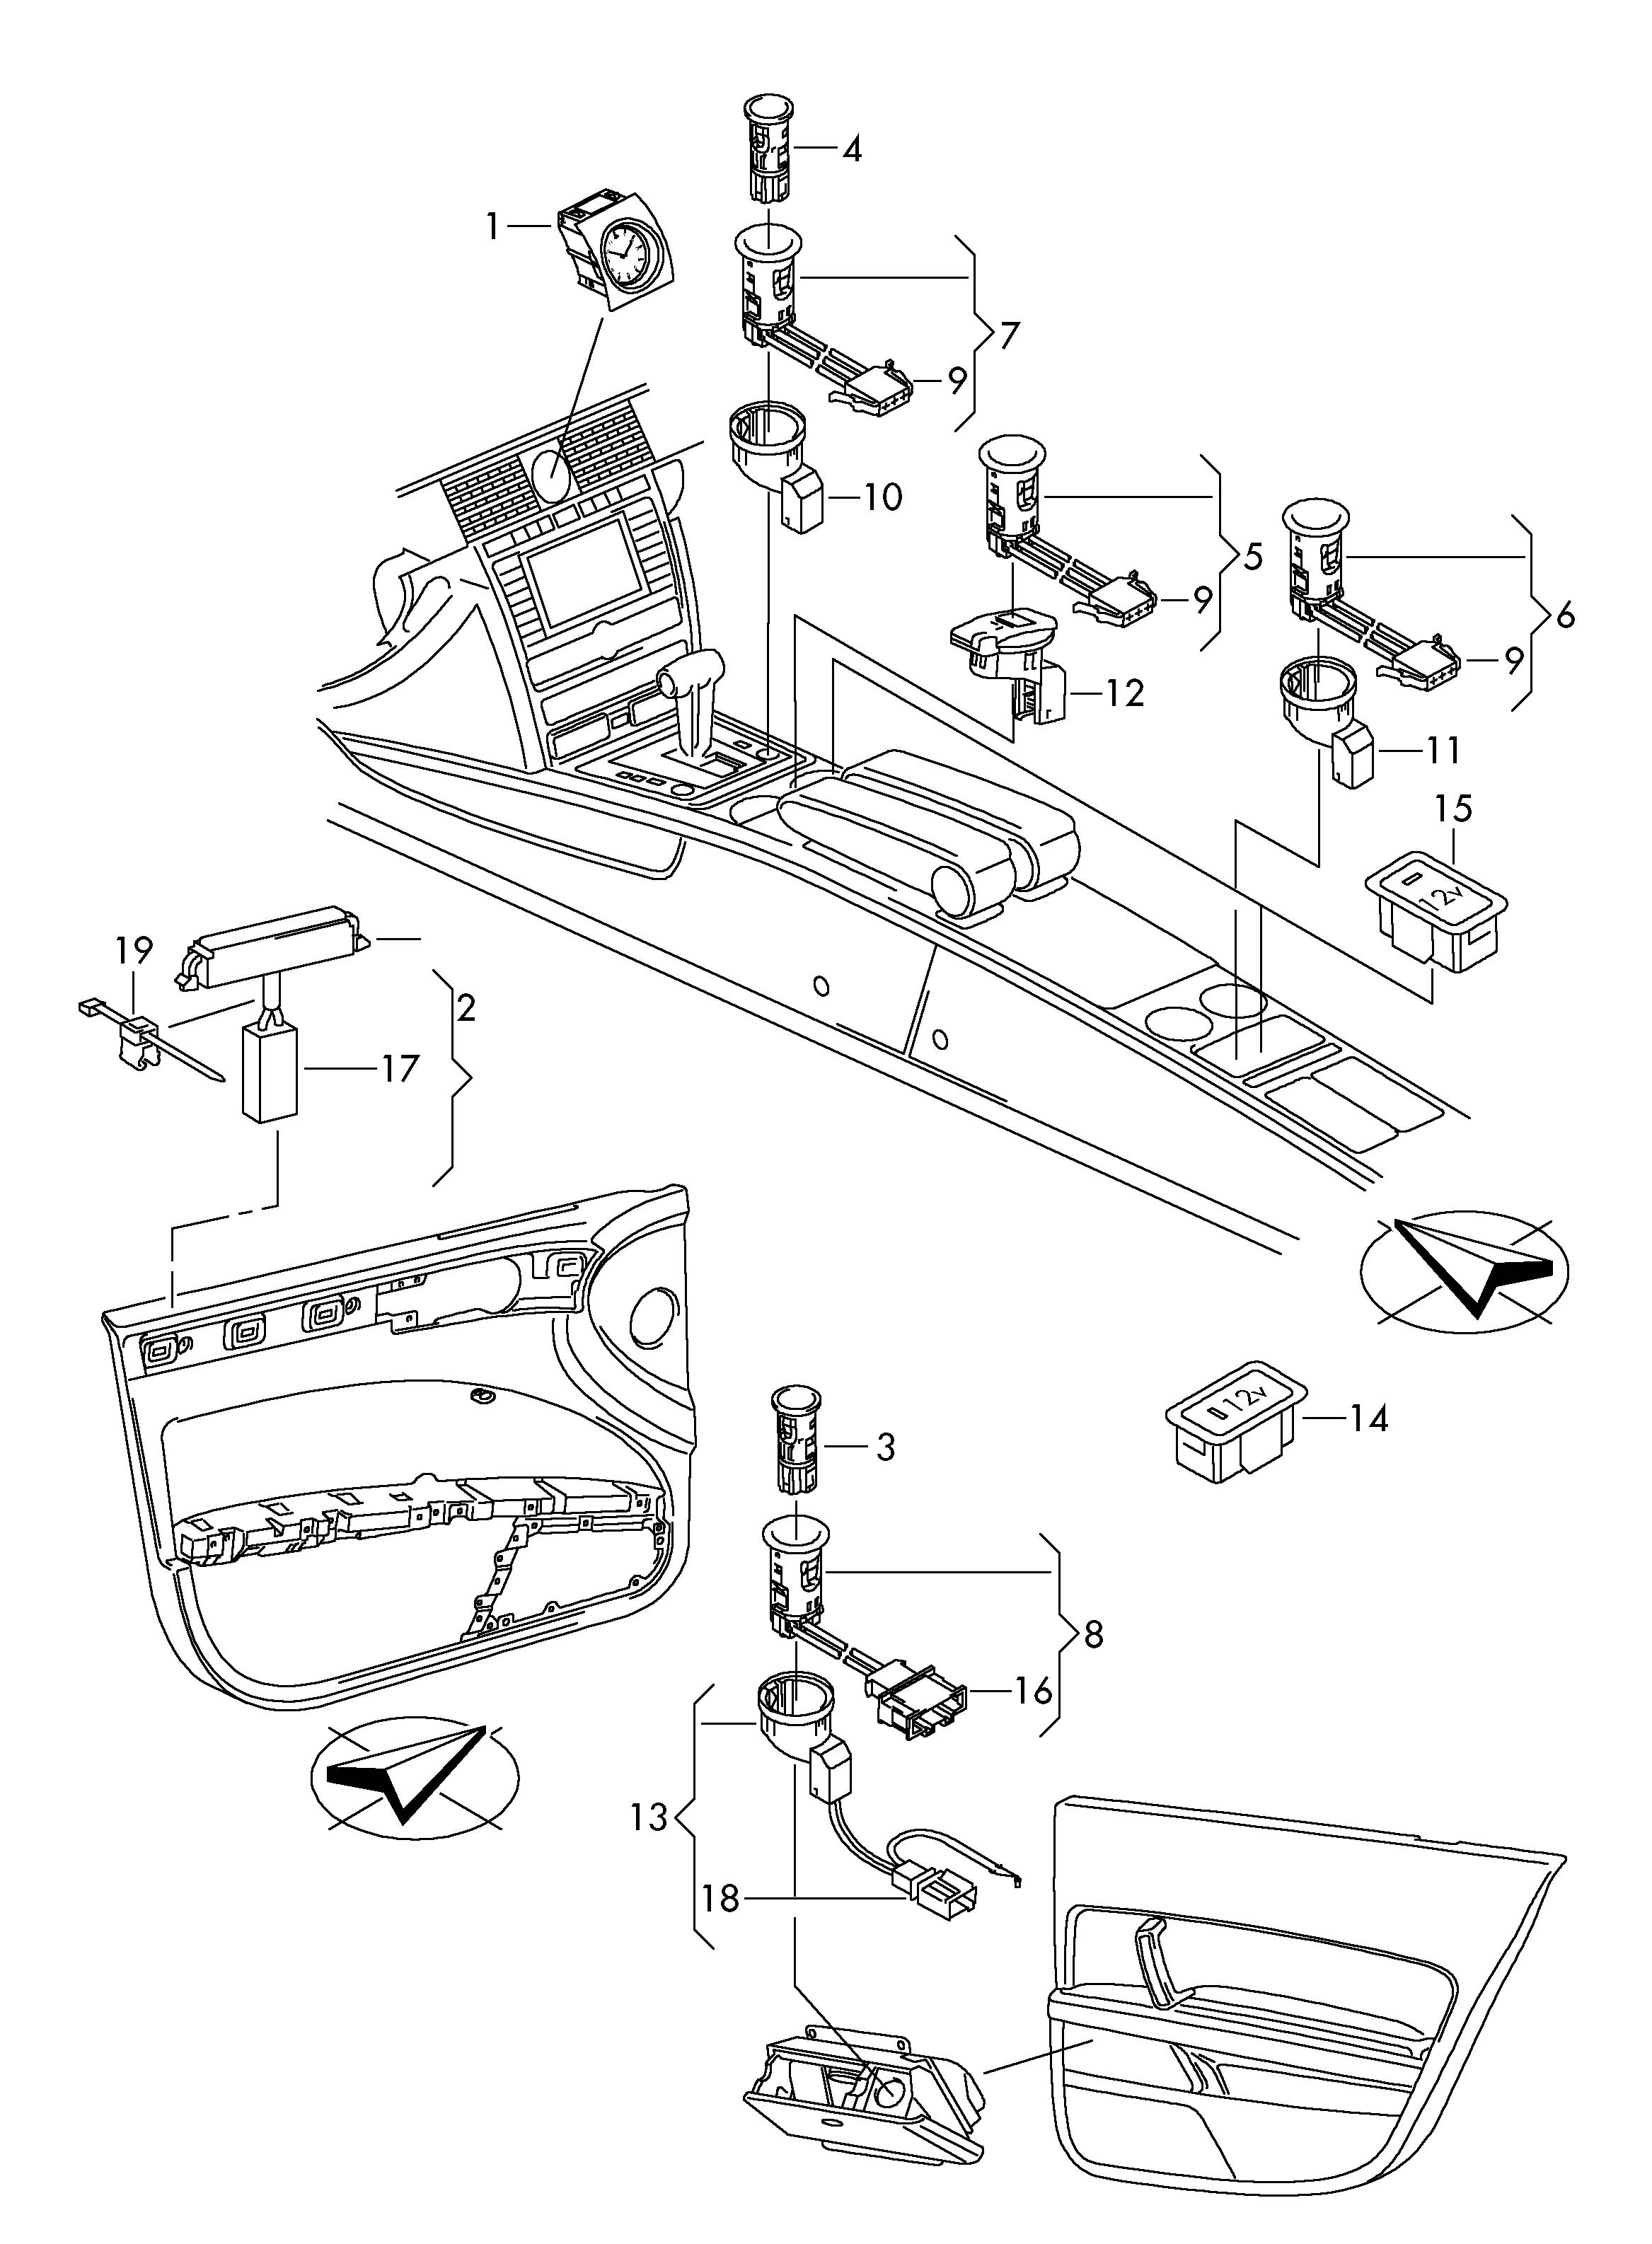 tags: #car cigarette lighter wiring#cigarette lighter wiring install#cigarette  lighter circuit diagram#car cigarette lighter diagram#12v cigarette lighter